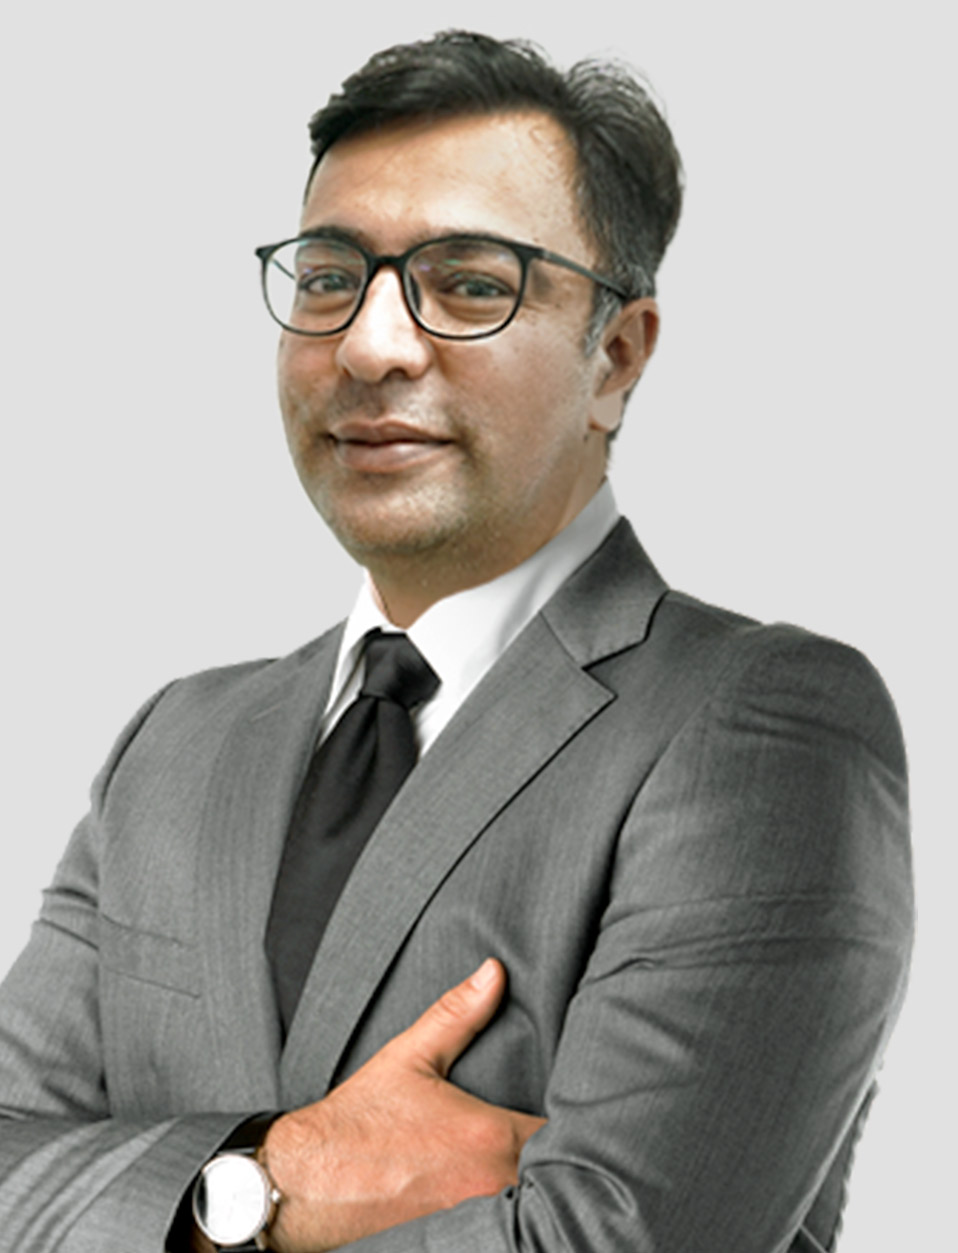 Ali Jawad Korotana